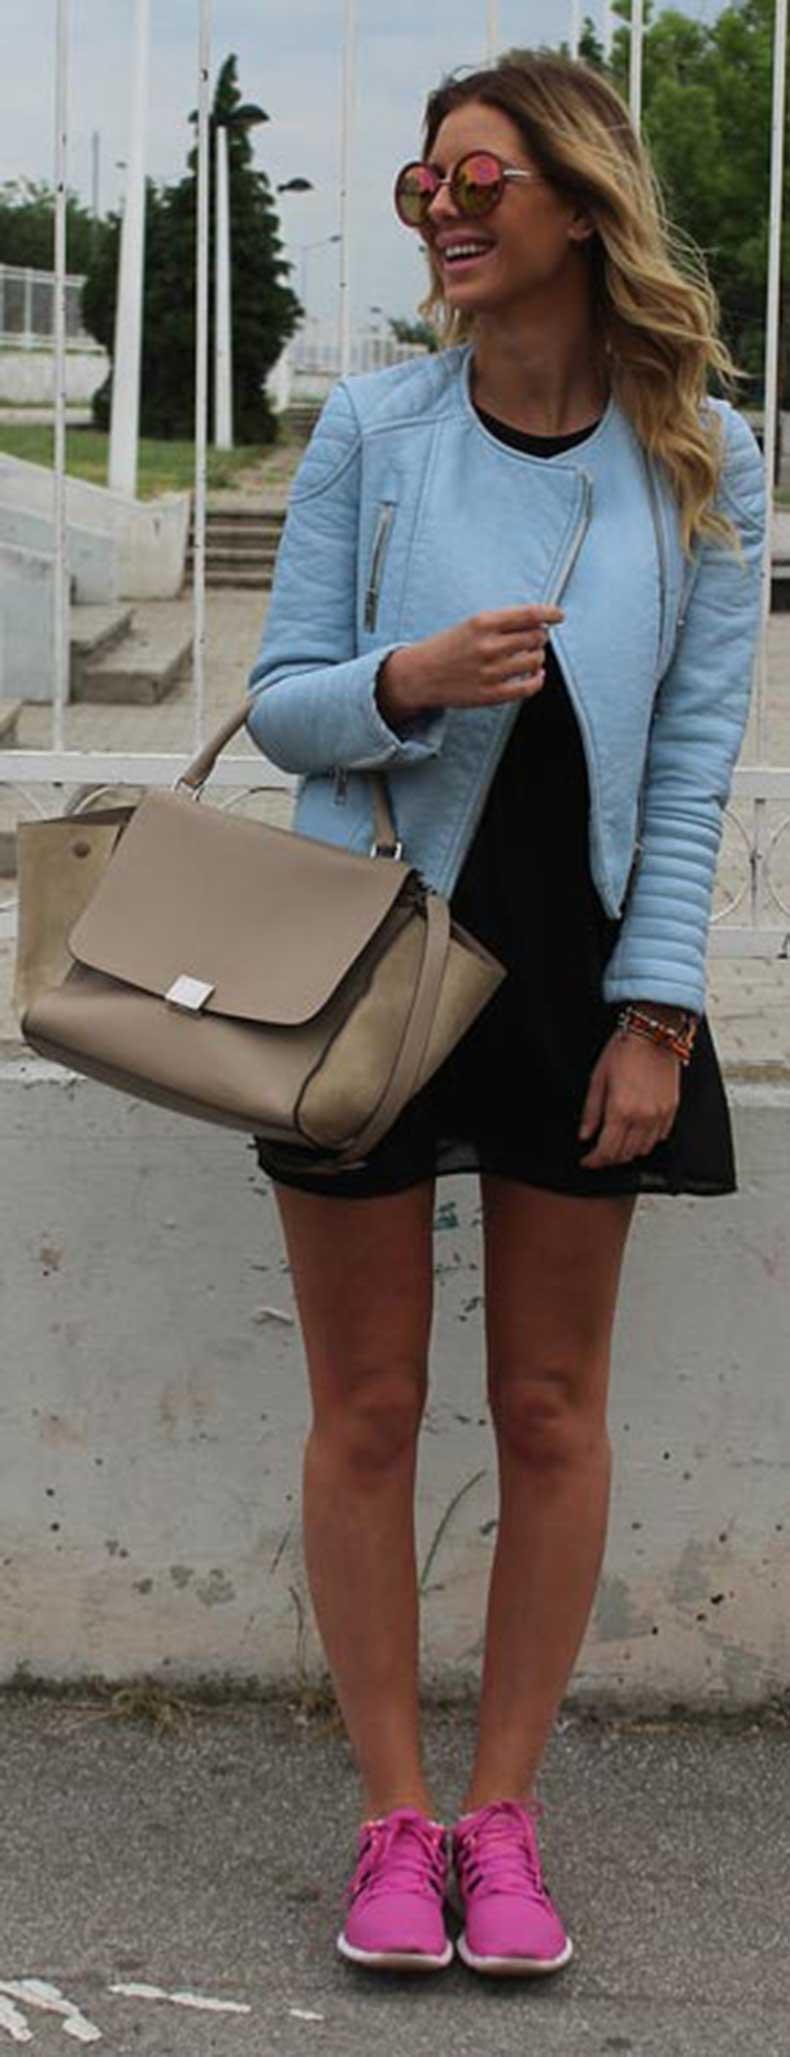 Little-Black-Dress-Blue-Leather-Jacket-Outfit